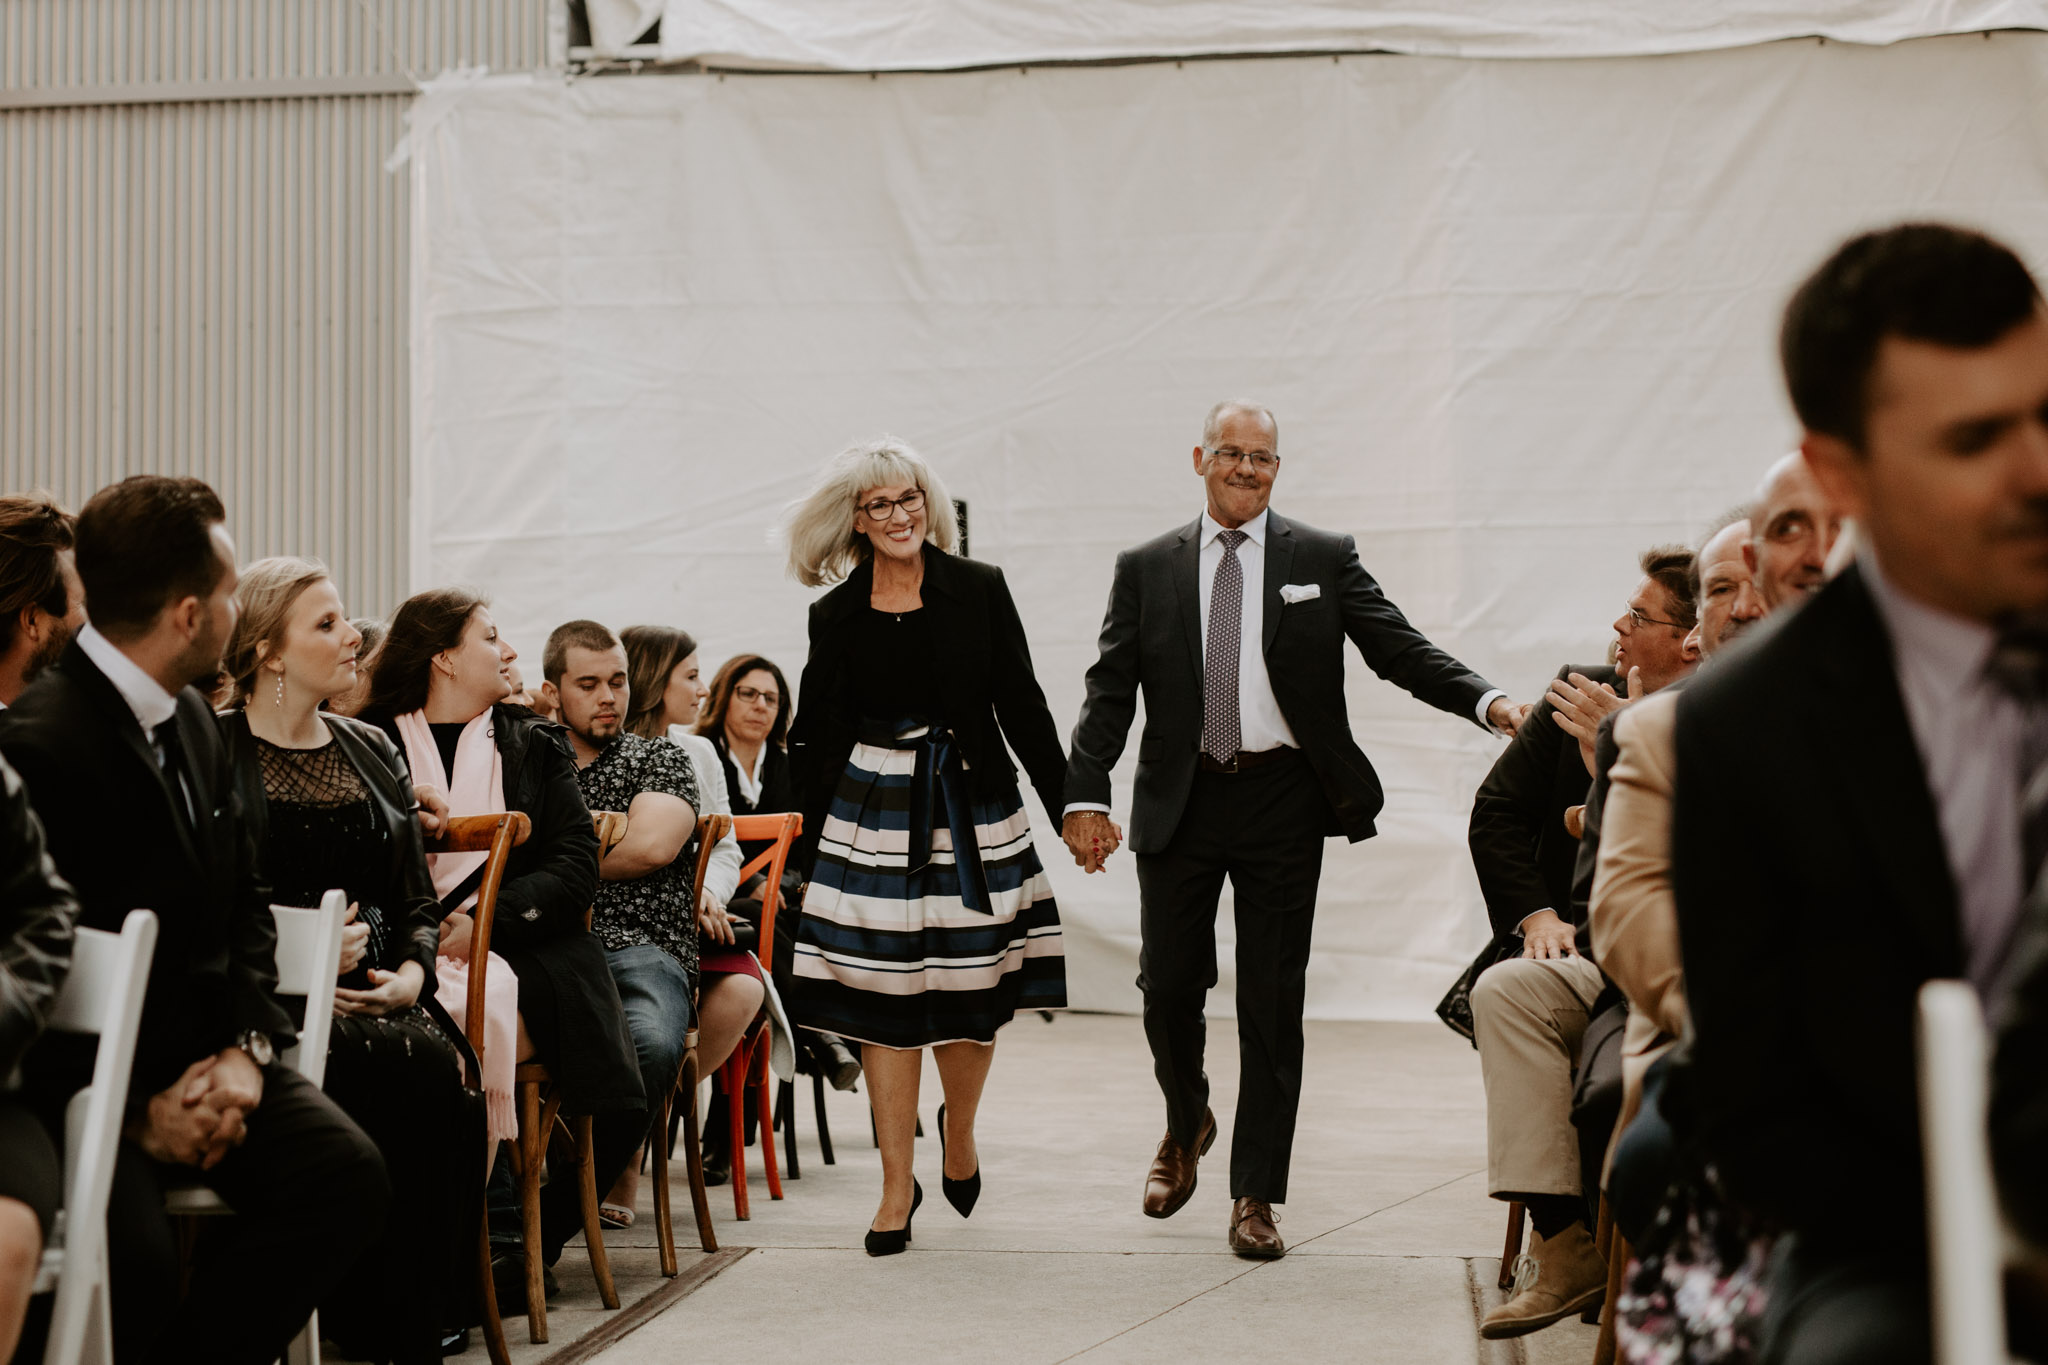 Liberty Village Wedding - groom's parents walk down the aisle